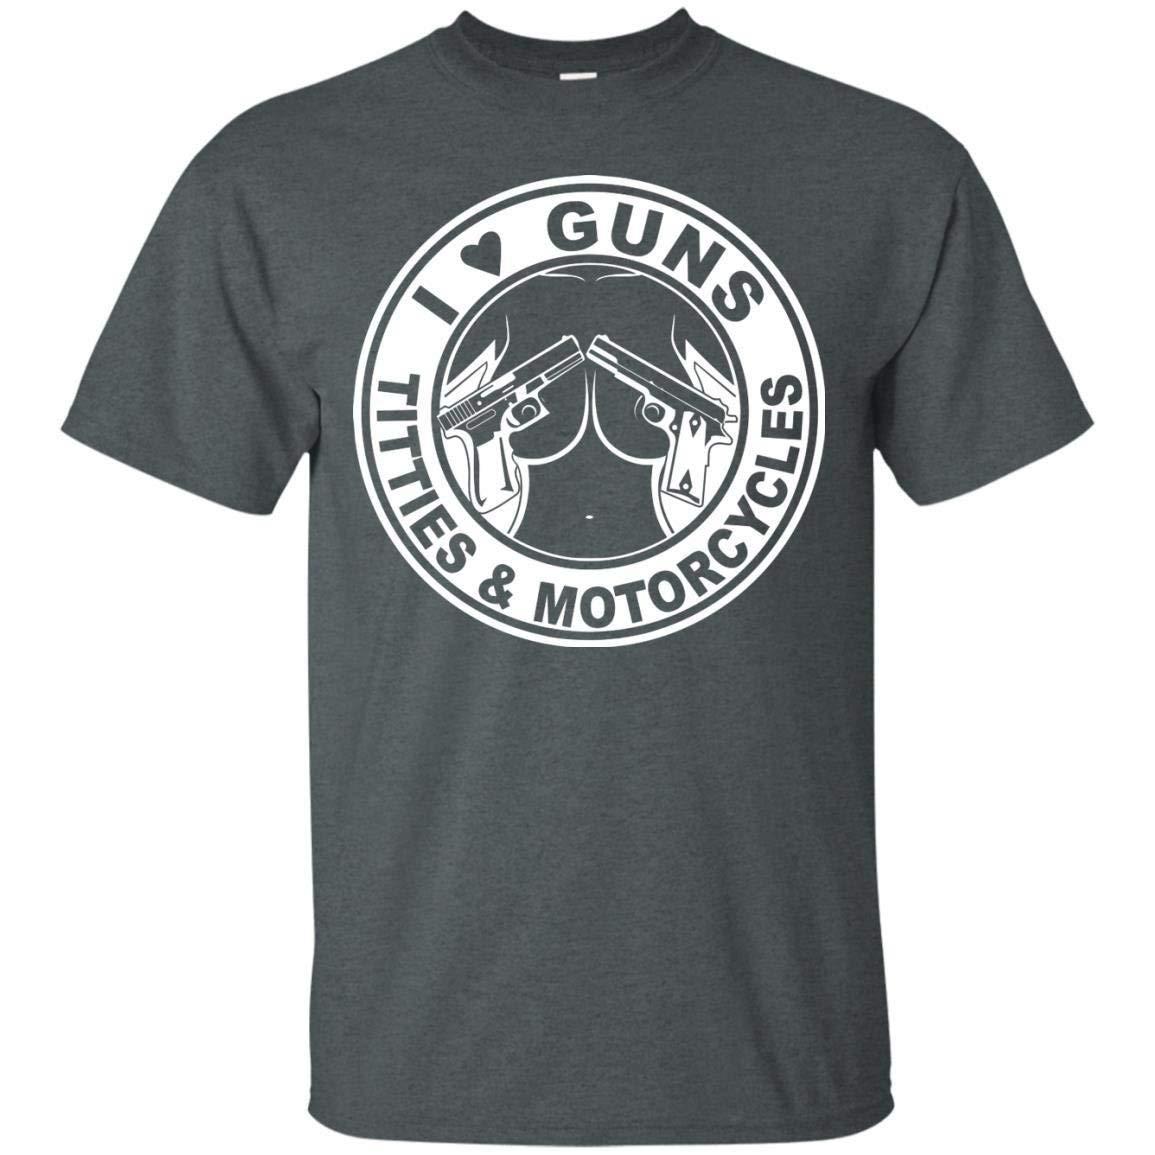 I Love Guns Titties Motorcycles T Shirt 3874